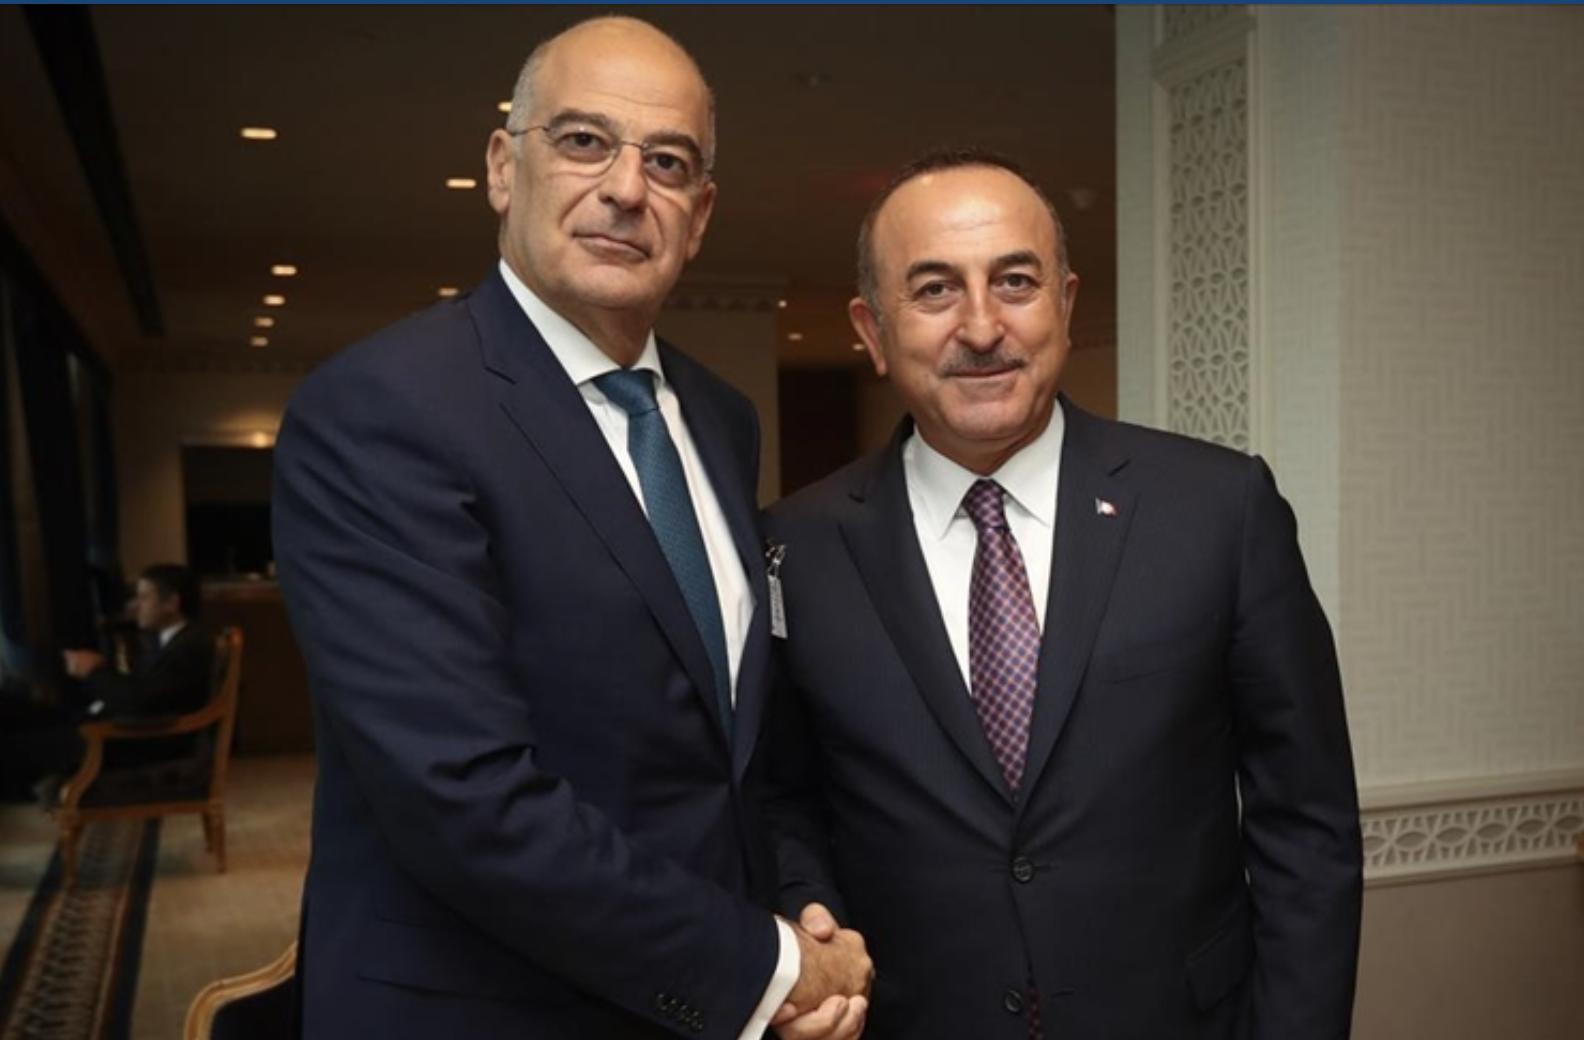 Turkey: Çavuşoğlu announces meeting with his Greek counterpart on April 14